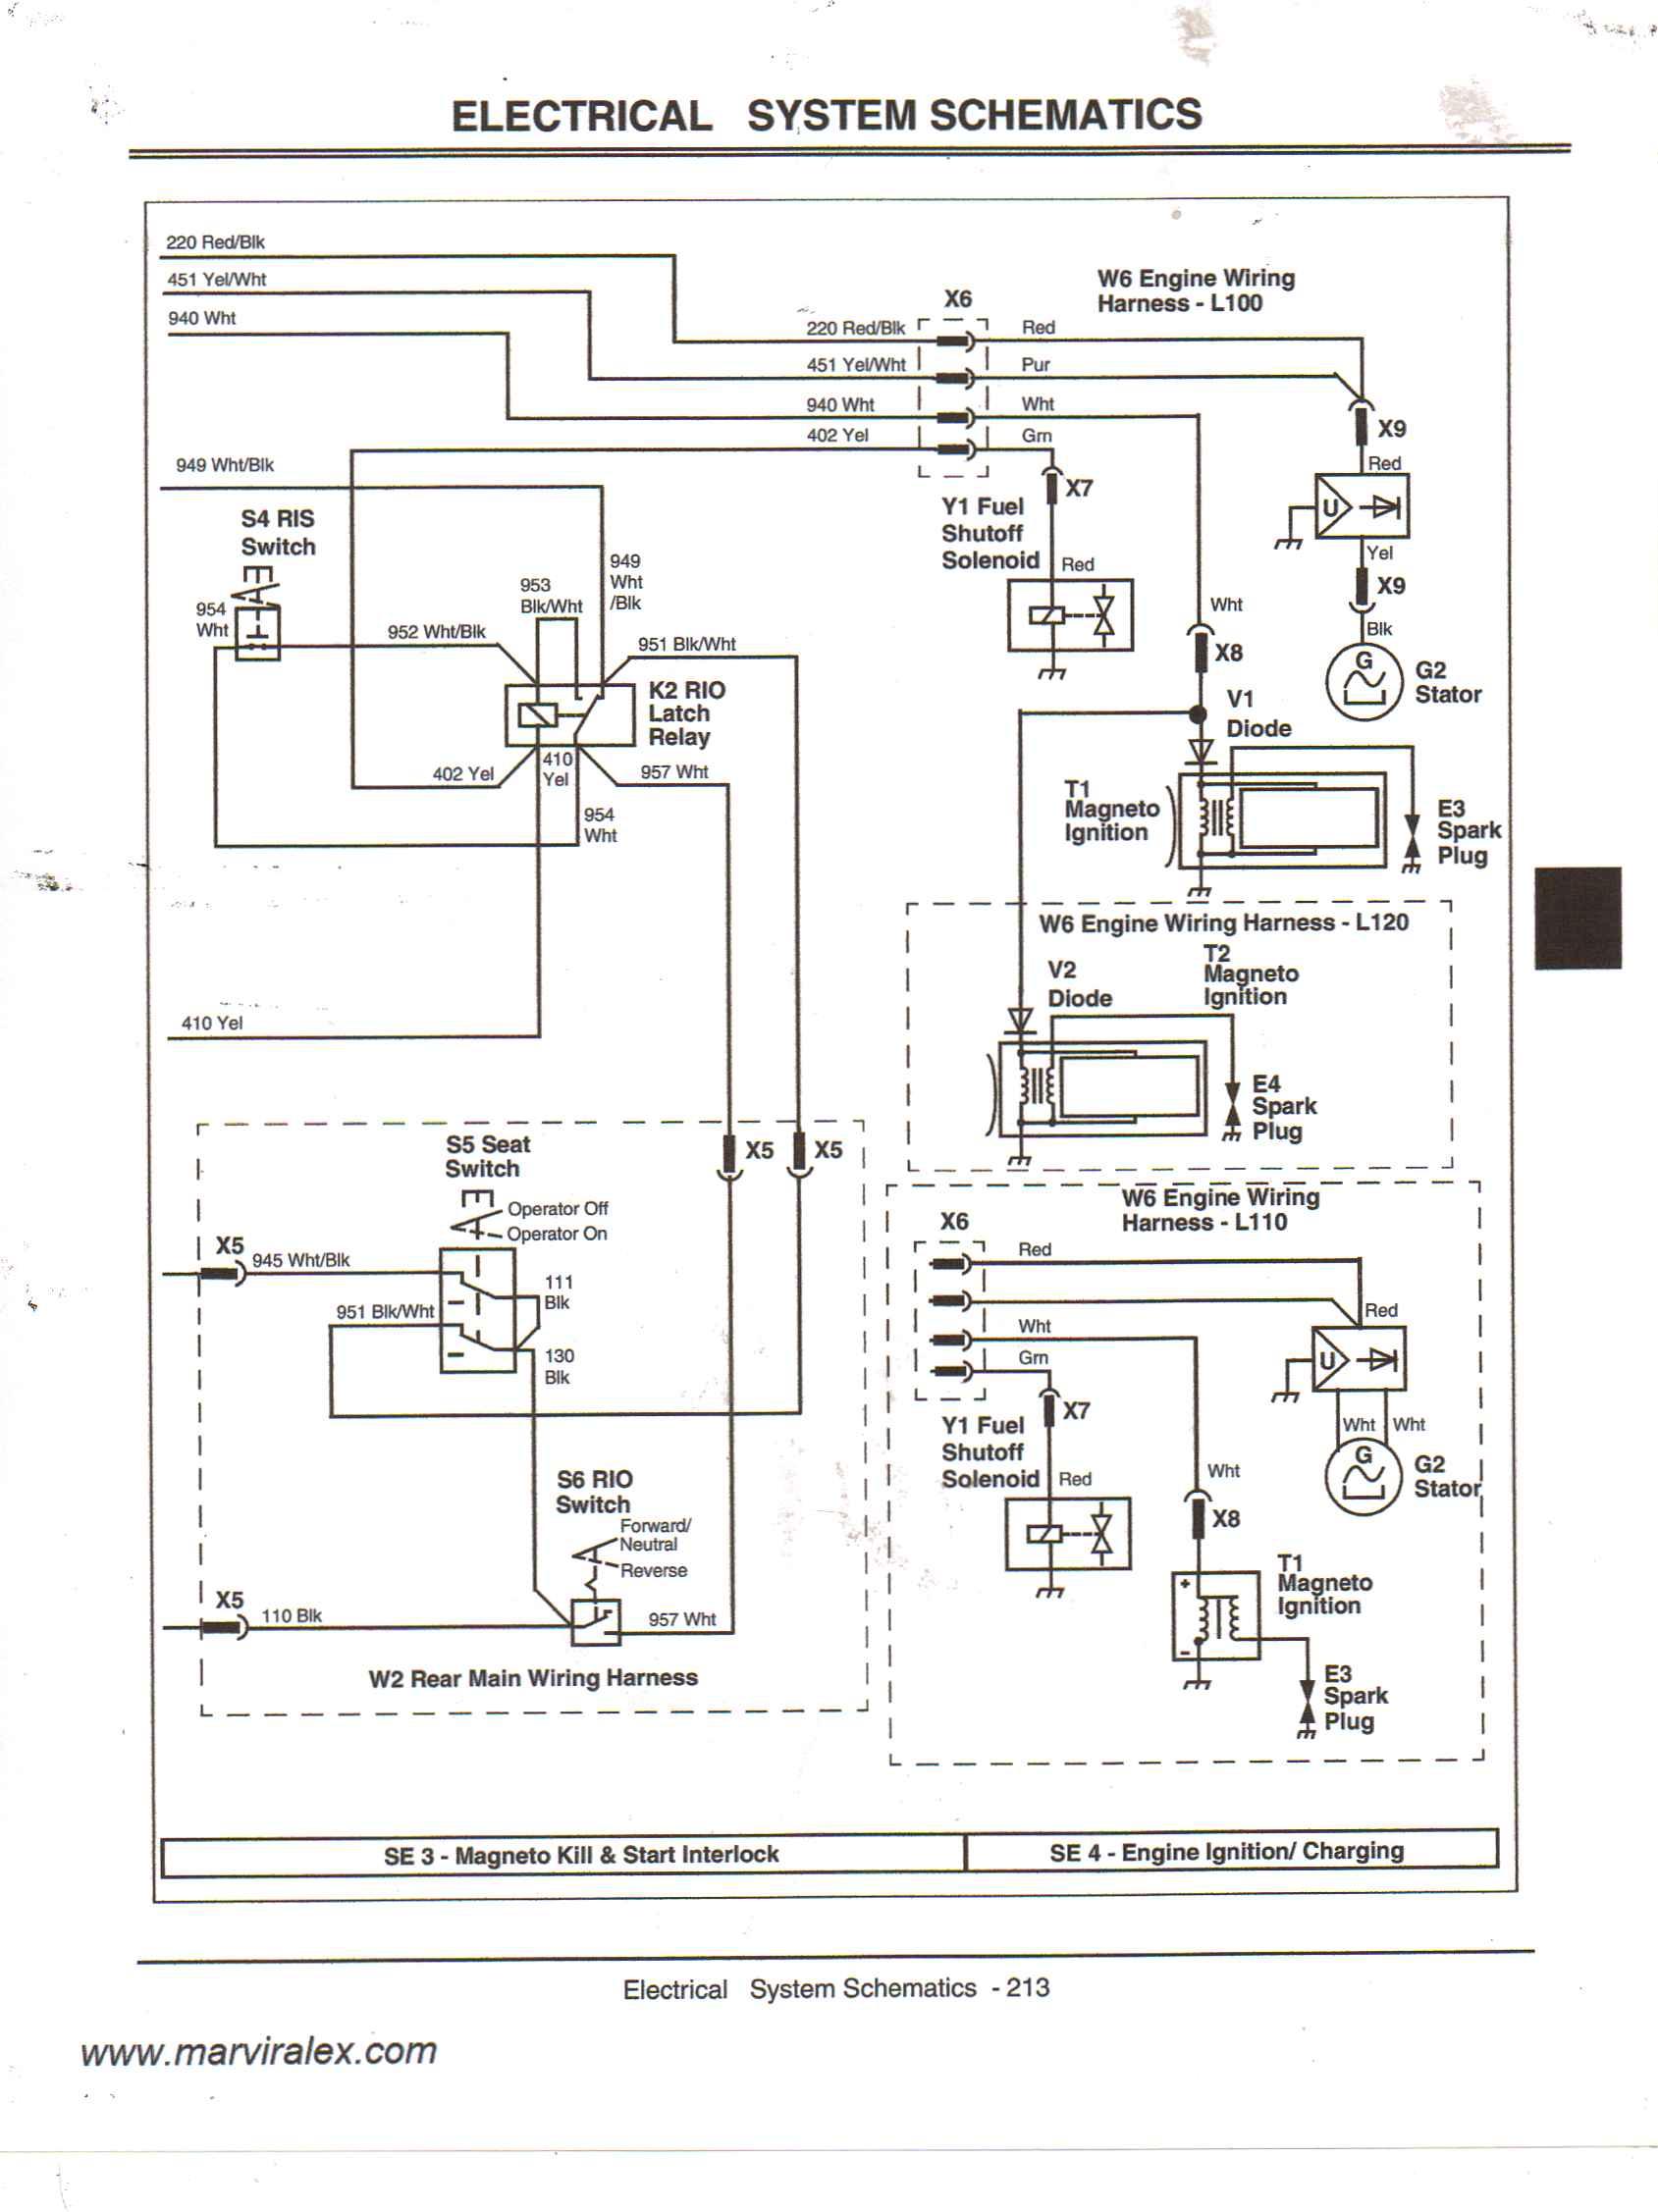 l100 wiring diagram switch wiring diagram john deere l100 wiring harness wiring libraryc0745348 bea5 4584 88e4 35e790d9bbc5 deere l100 l110 l120 wiring schematic